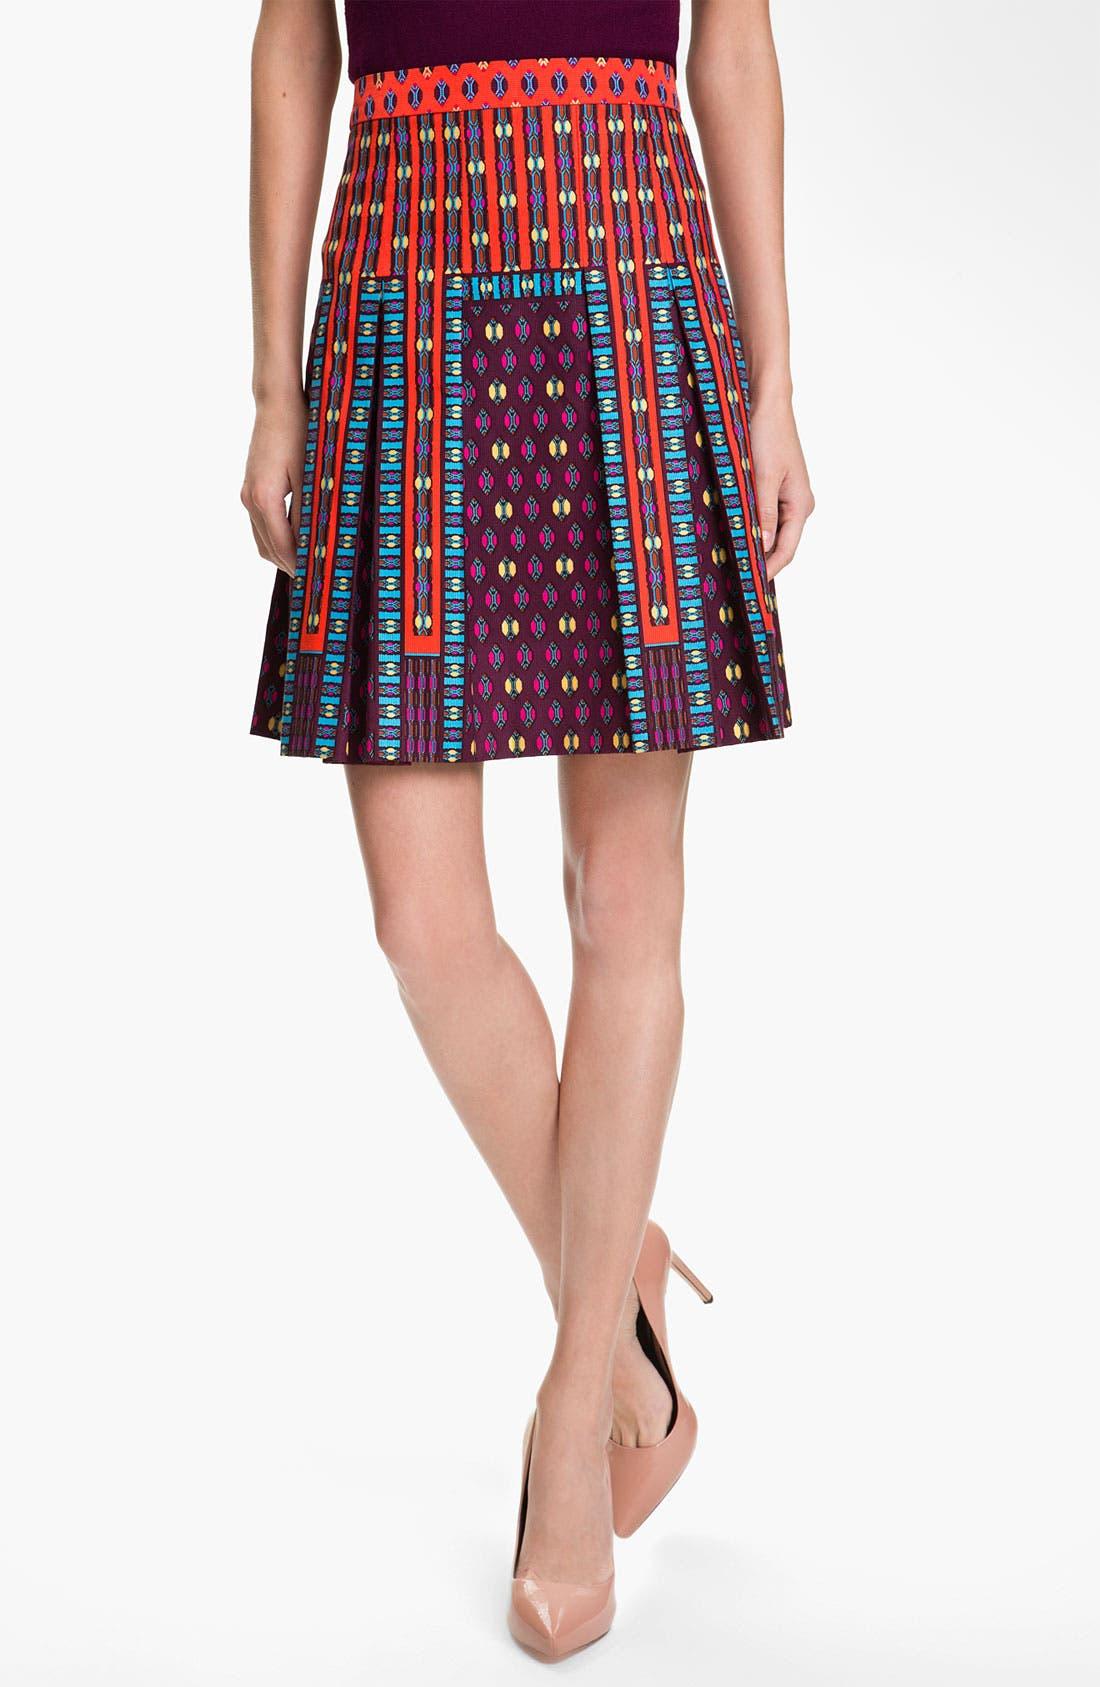 Alternate Image 1 Selected - Nanette Lepore 'Universe' Pleated A-Line Skirt